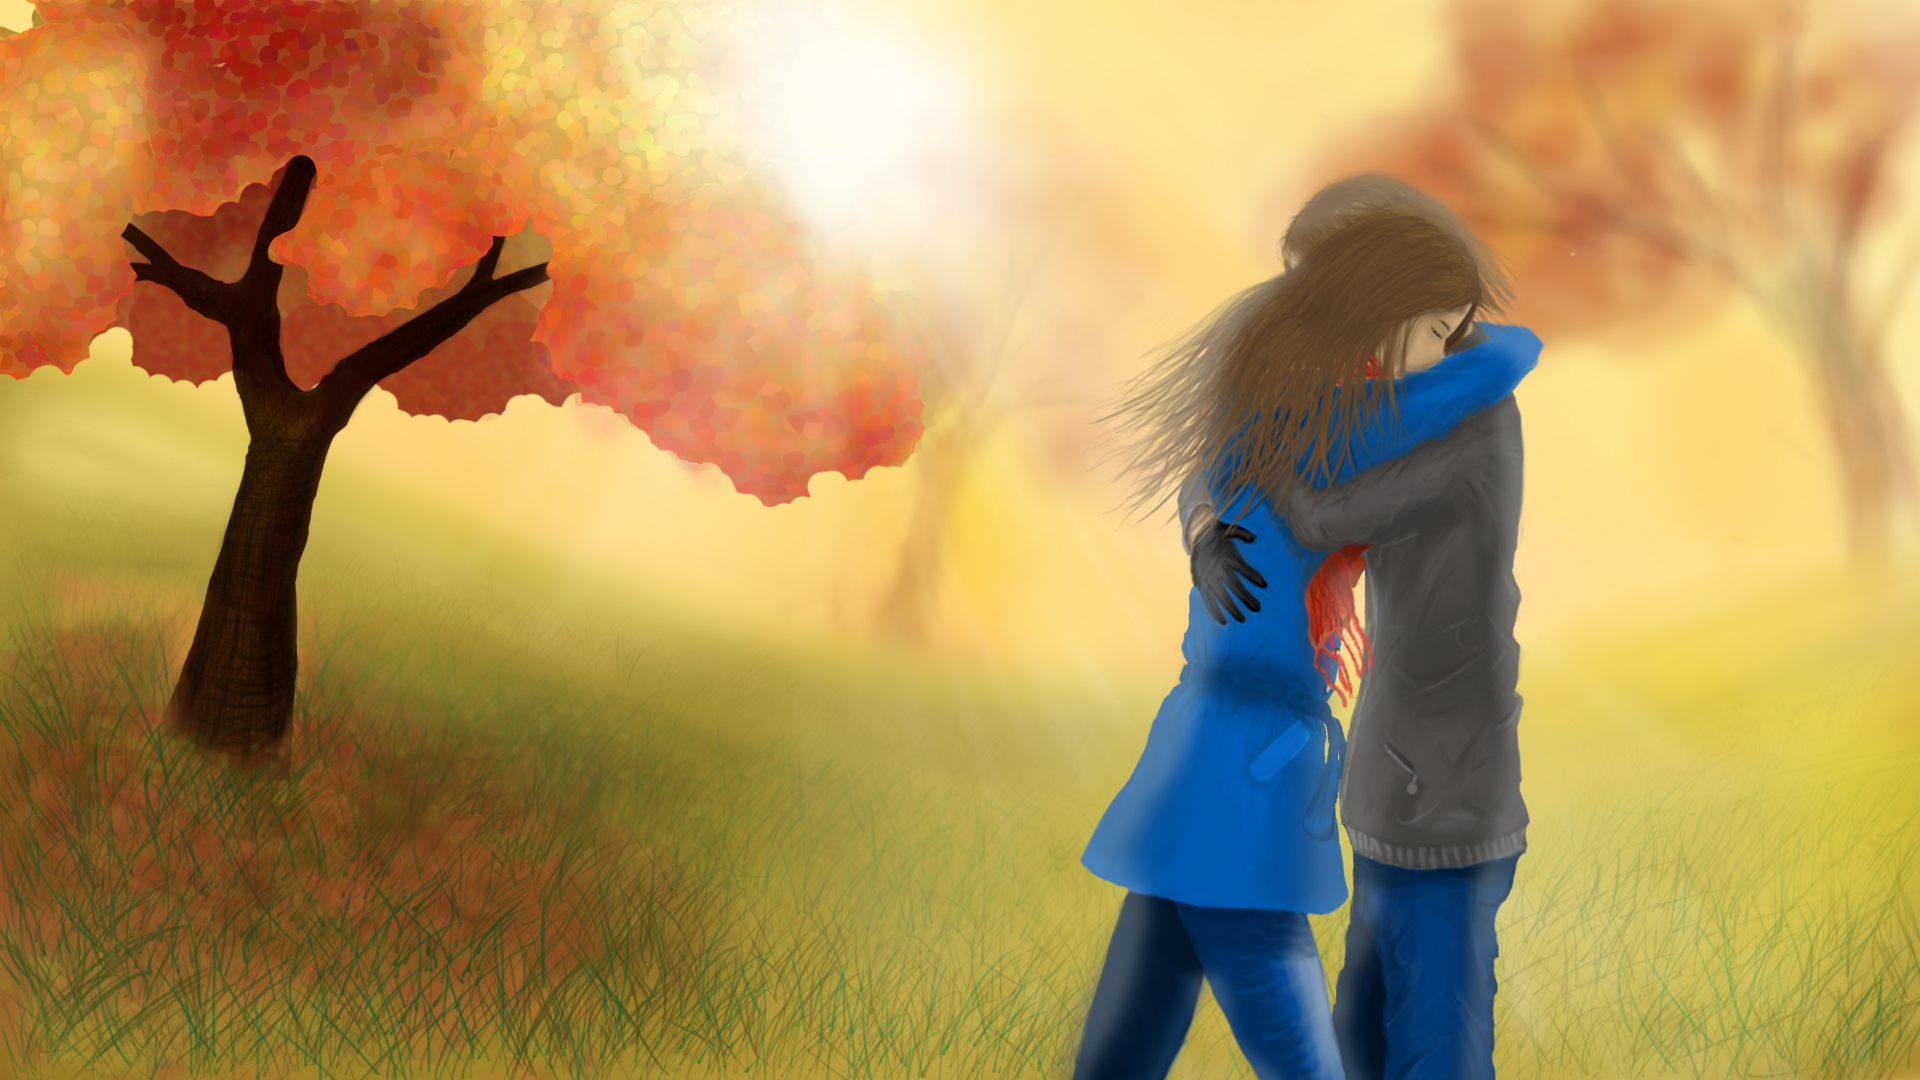 couple hug wallpaper download - sf wallpaper